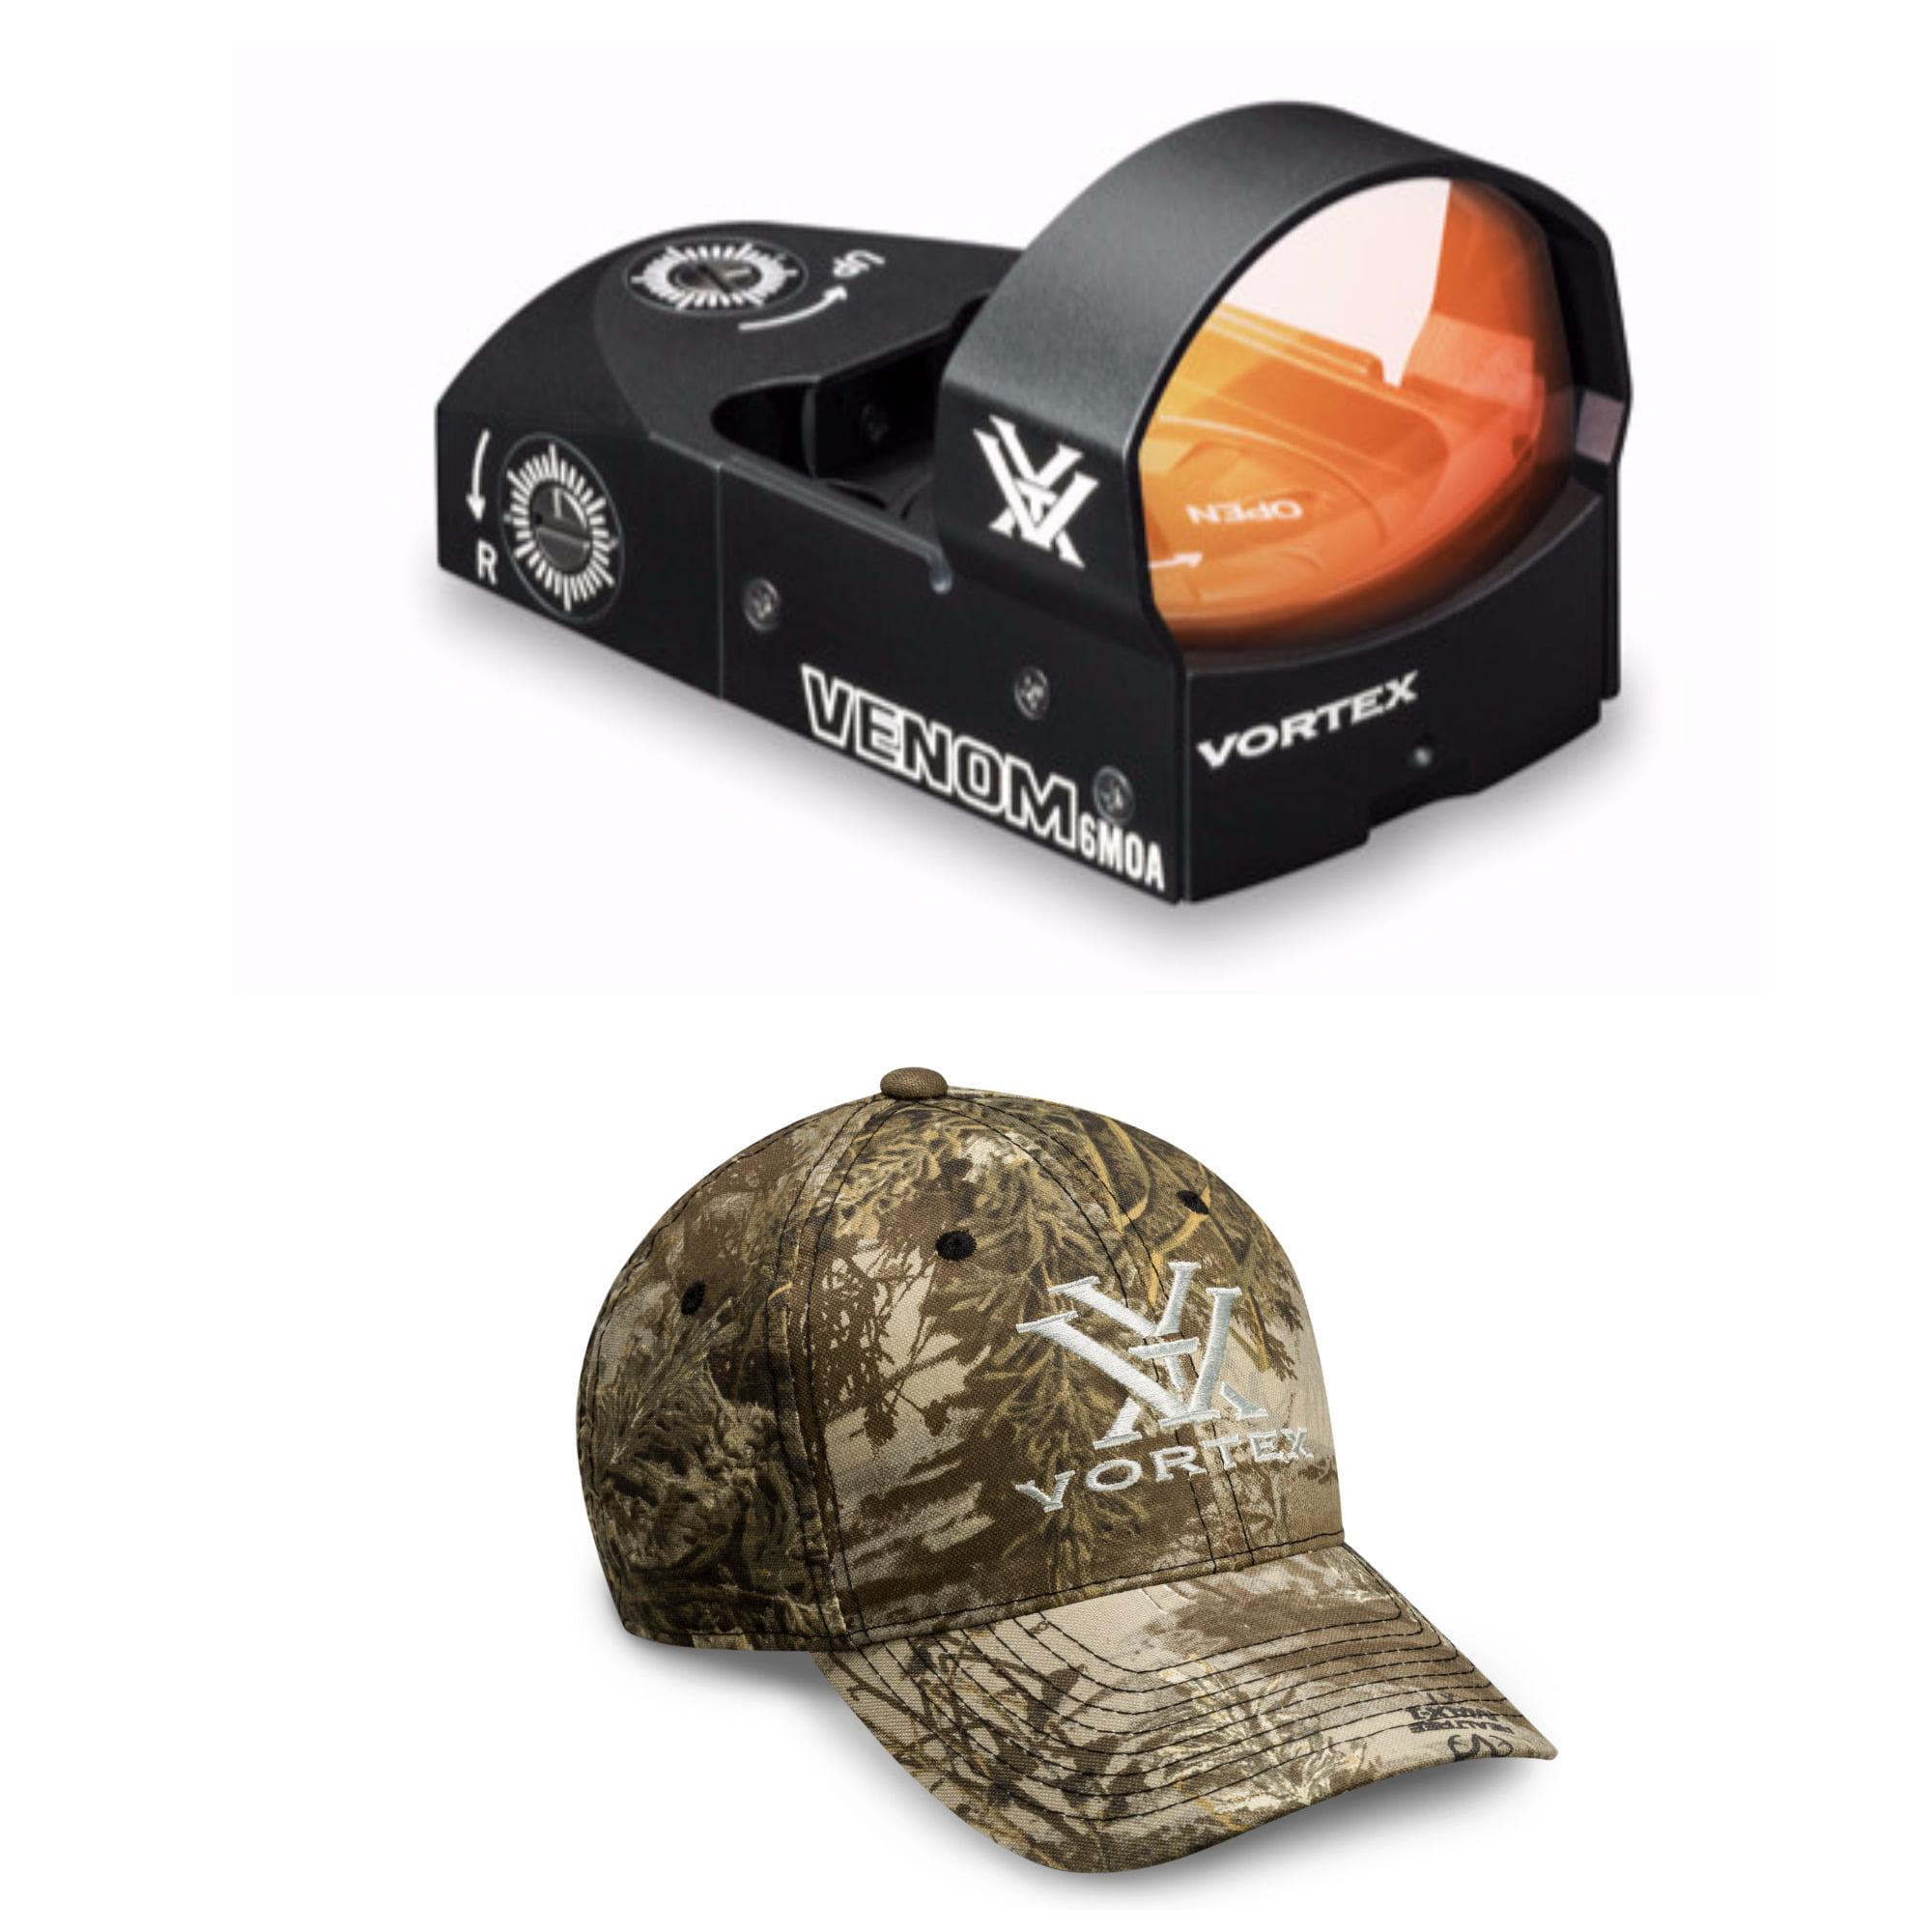 Vortex 6 MOA Venom Red Dot Sight with Vortex Hat (Realtree Max-1 XT Camo)